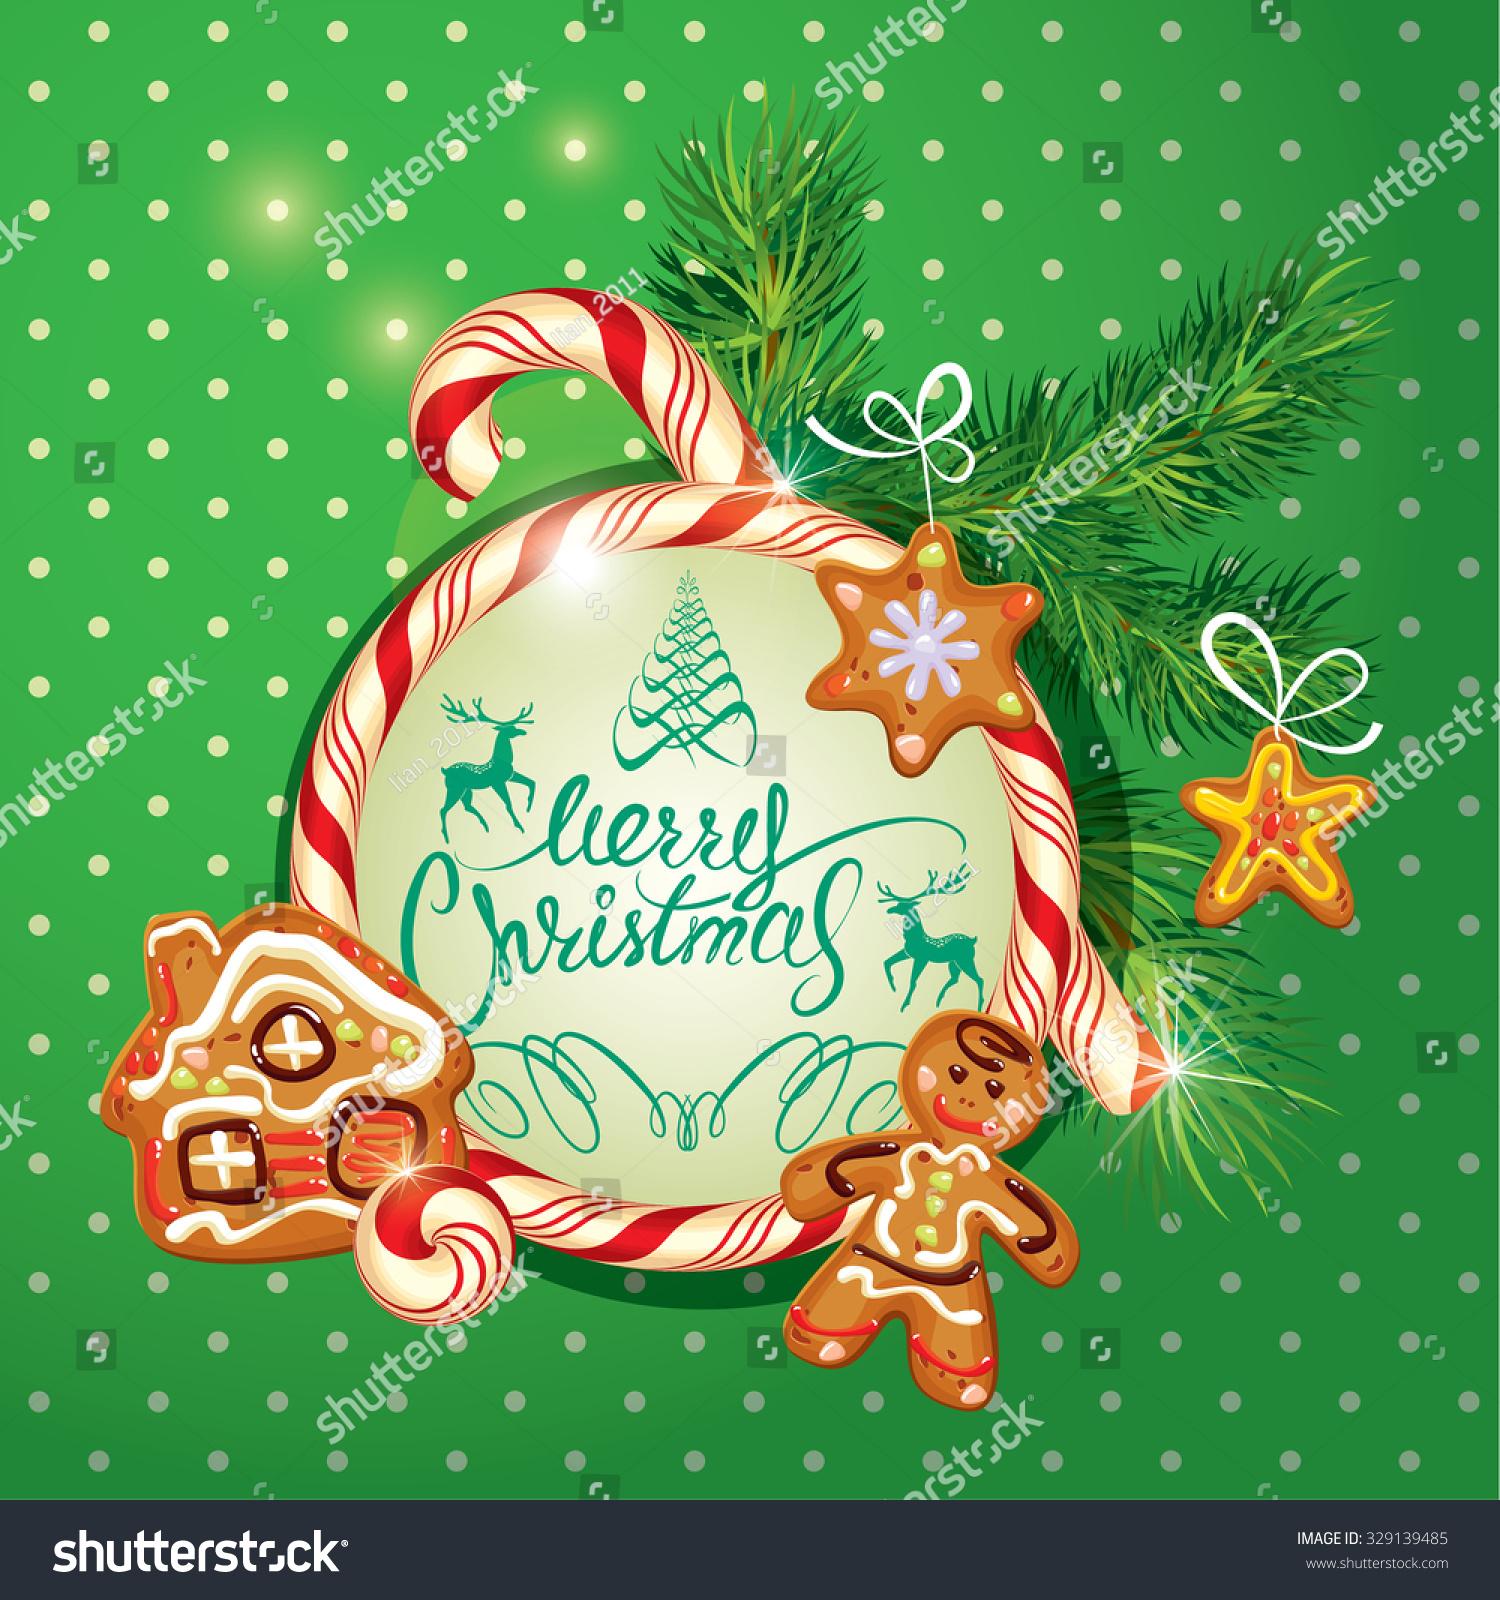 New year holiday greeting card xmas stock vector 329139485 new year holiday greeting card with xmas gingerbread man stars and house cartoons kristyandbryce Gallery